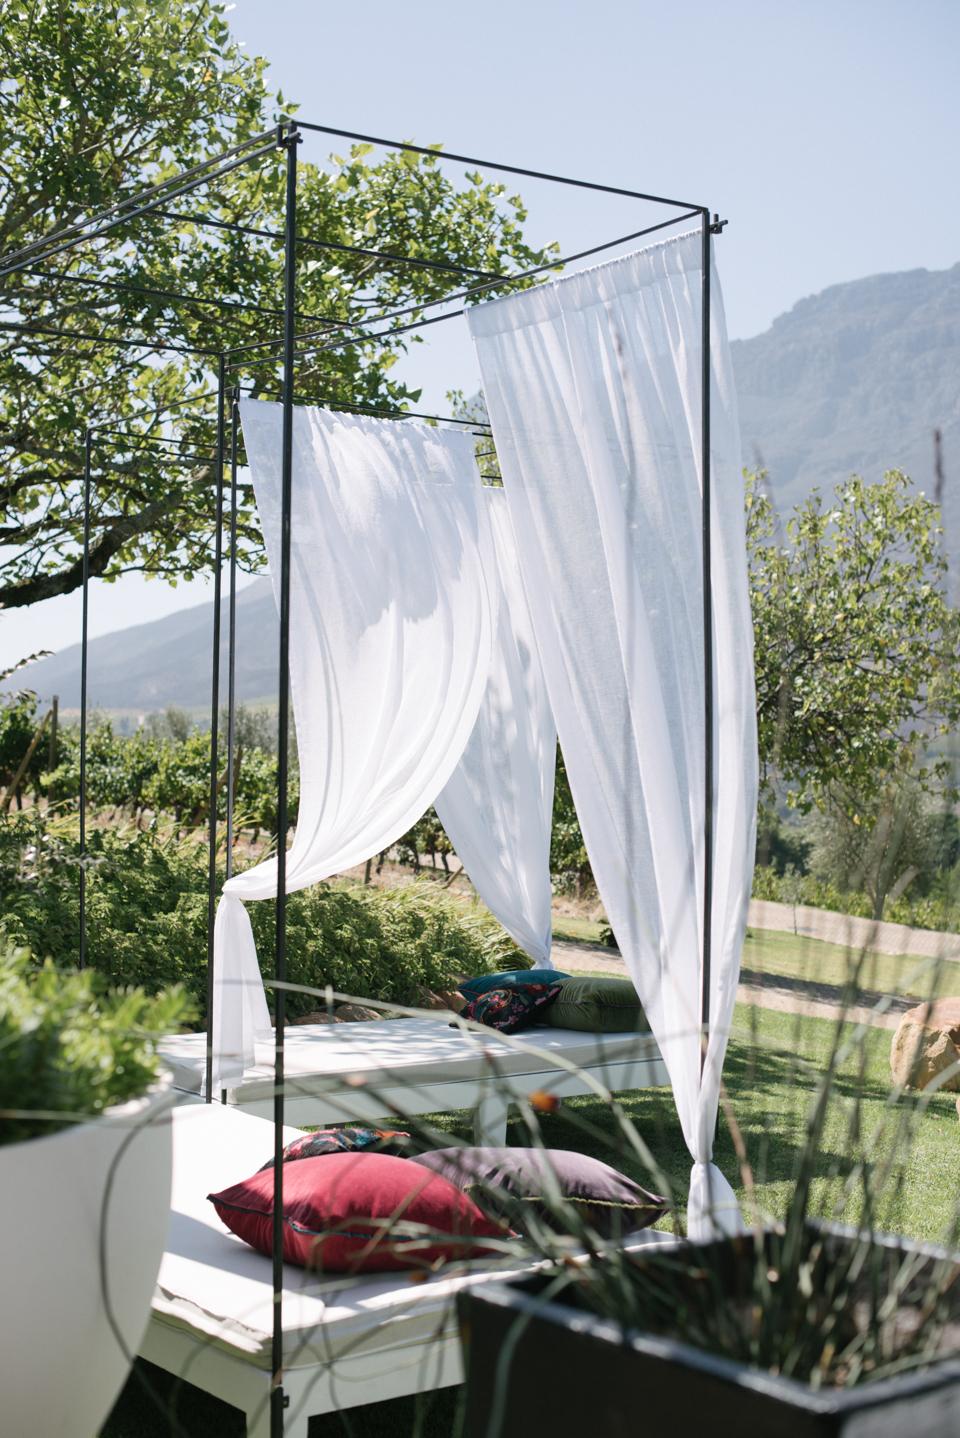 Grace and Alfonso wedding Clouds Estate Stellenbosch South Africa shot by dna photographers 29.jpg